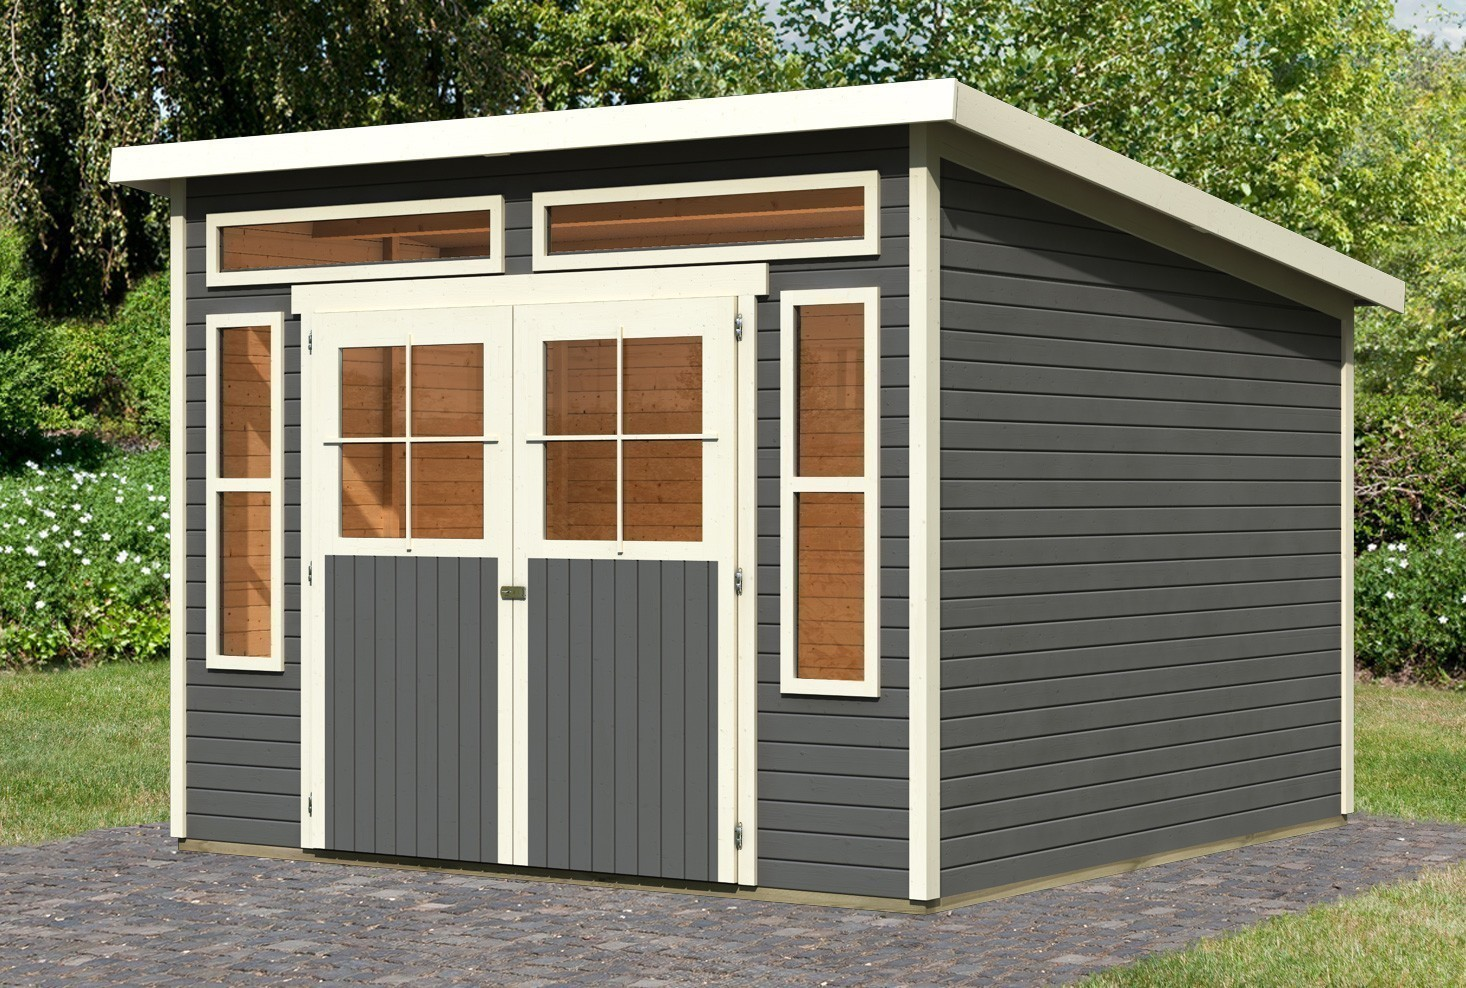 karibu gartenhaus 19 mm tinkenau 8 terragrau 334x331cm bei. Black Bedroom Furniture Sets. Home Design Ideas